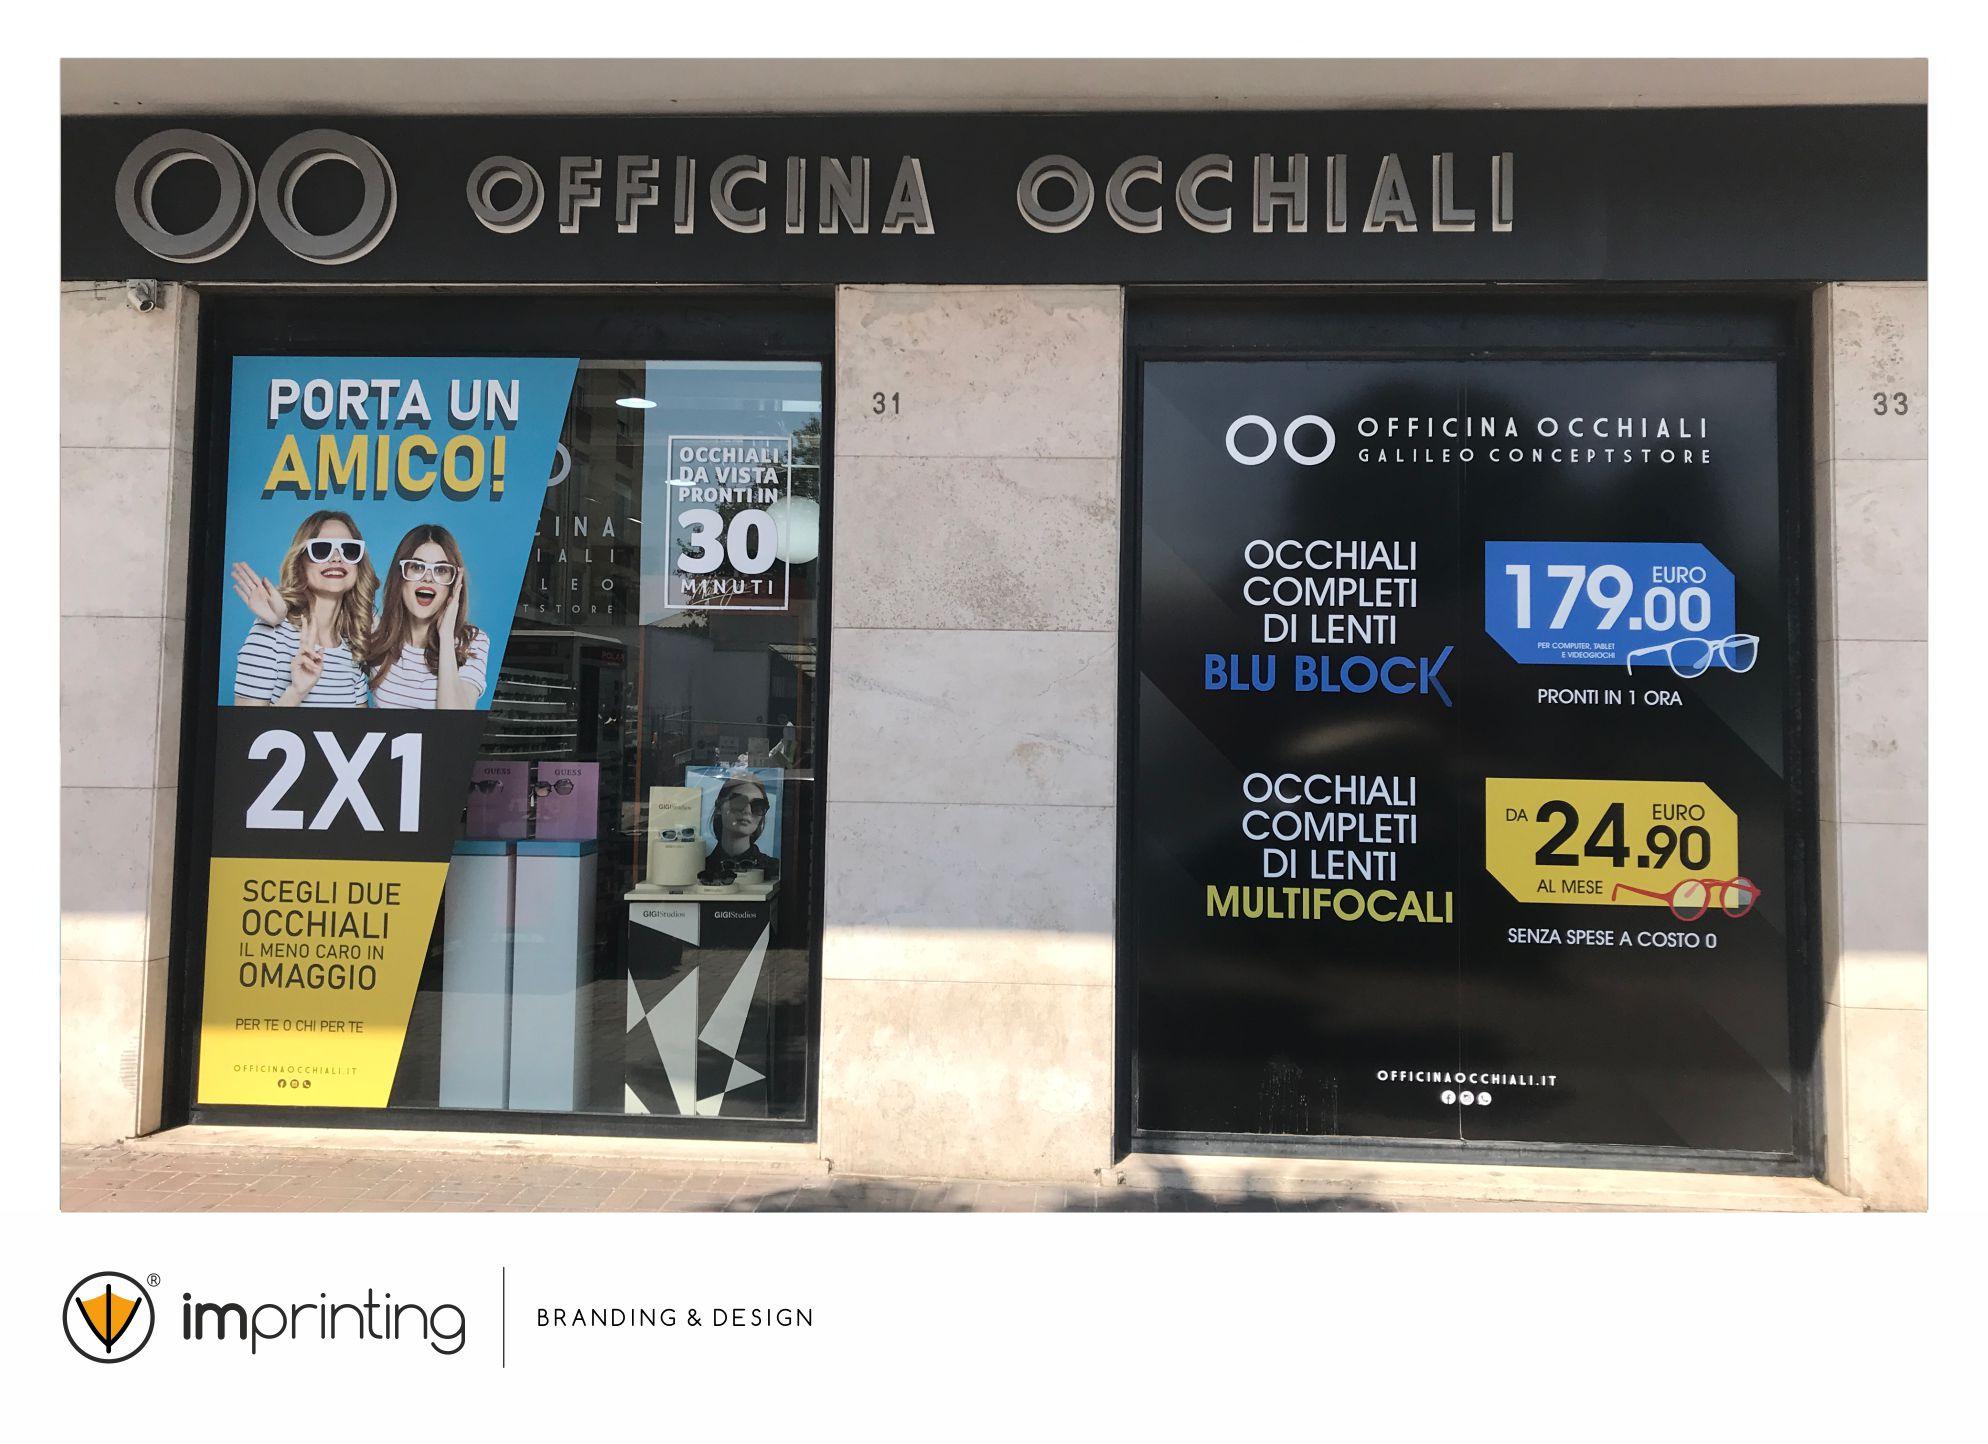 Officina Occhiali  - vetrofanie IMPRINTING Ostia